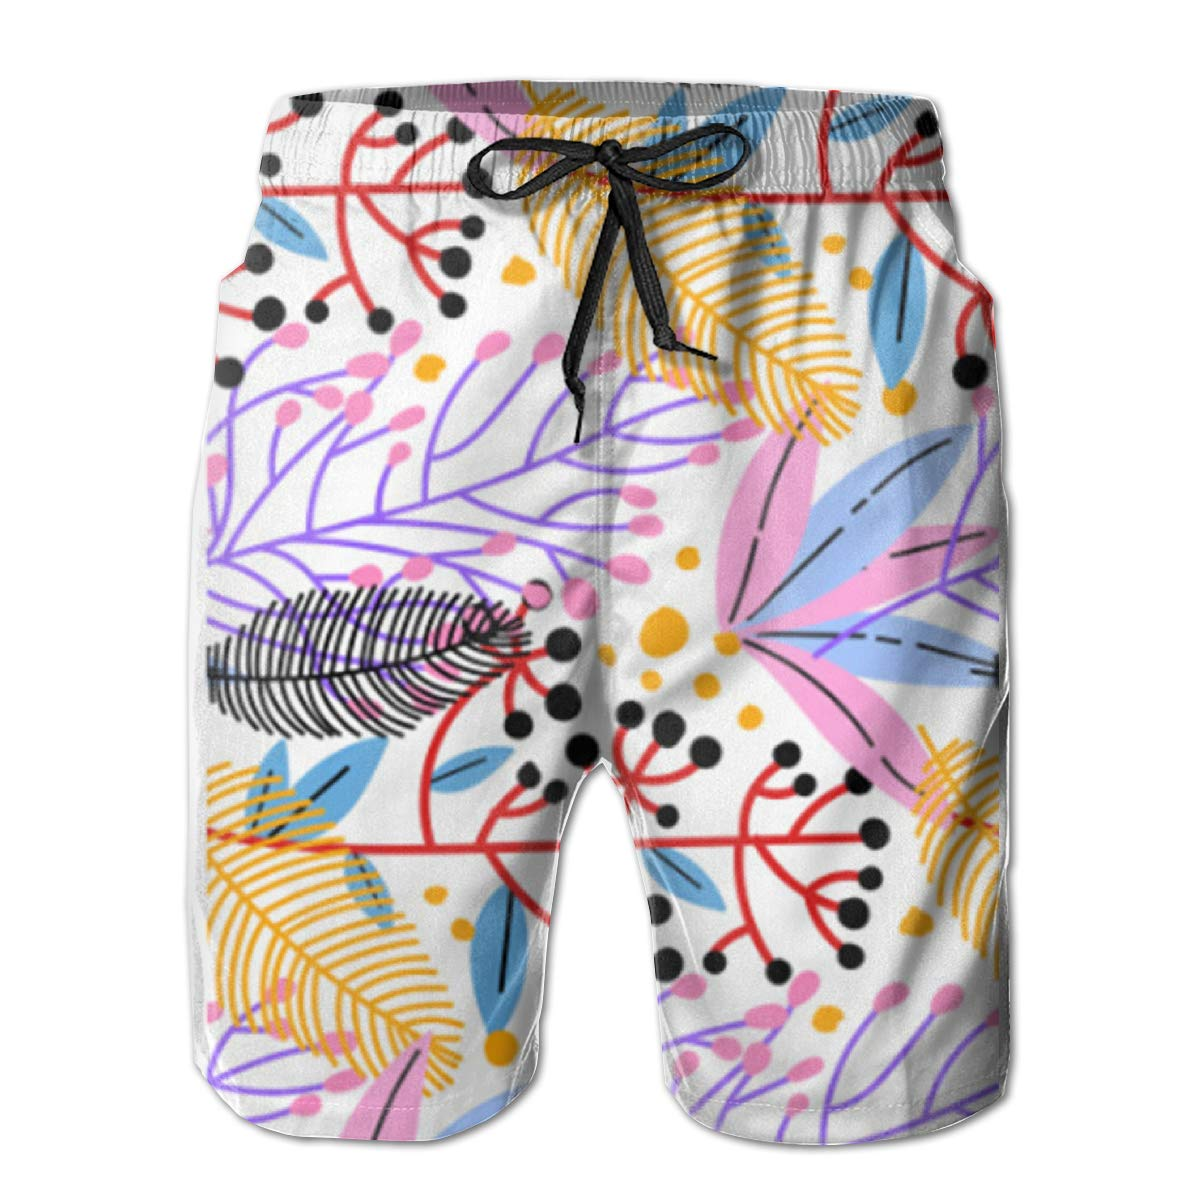 ZHANGEN Vector Floral Pattern Beach Board Shorts Mens Beach Shorts Swim Trunks Swimsuit Athletic Shorts